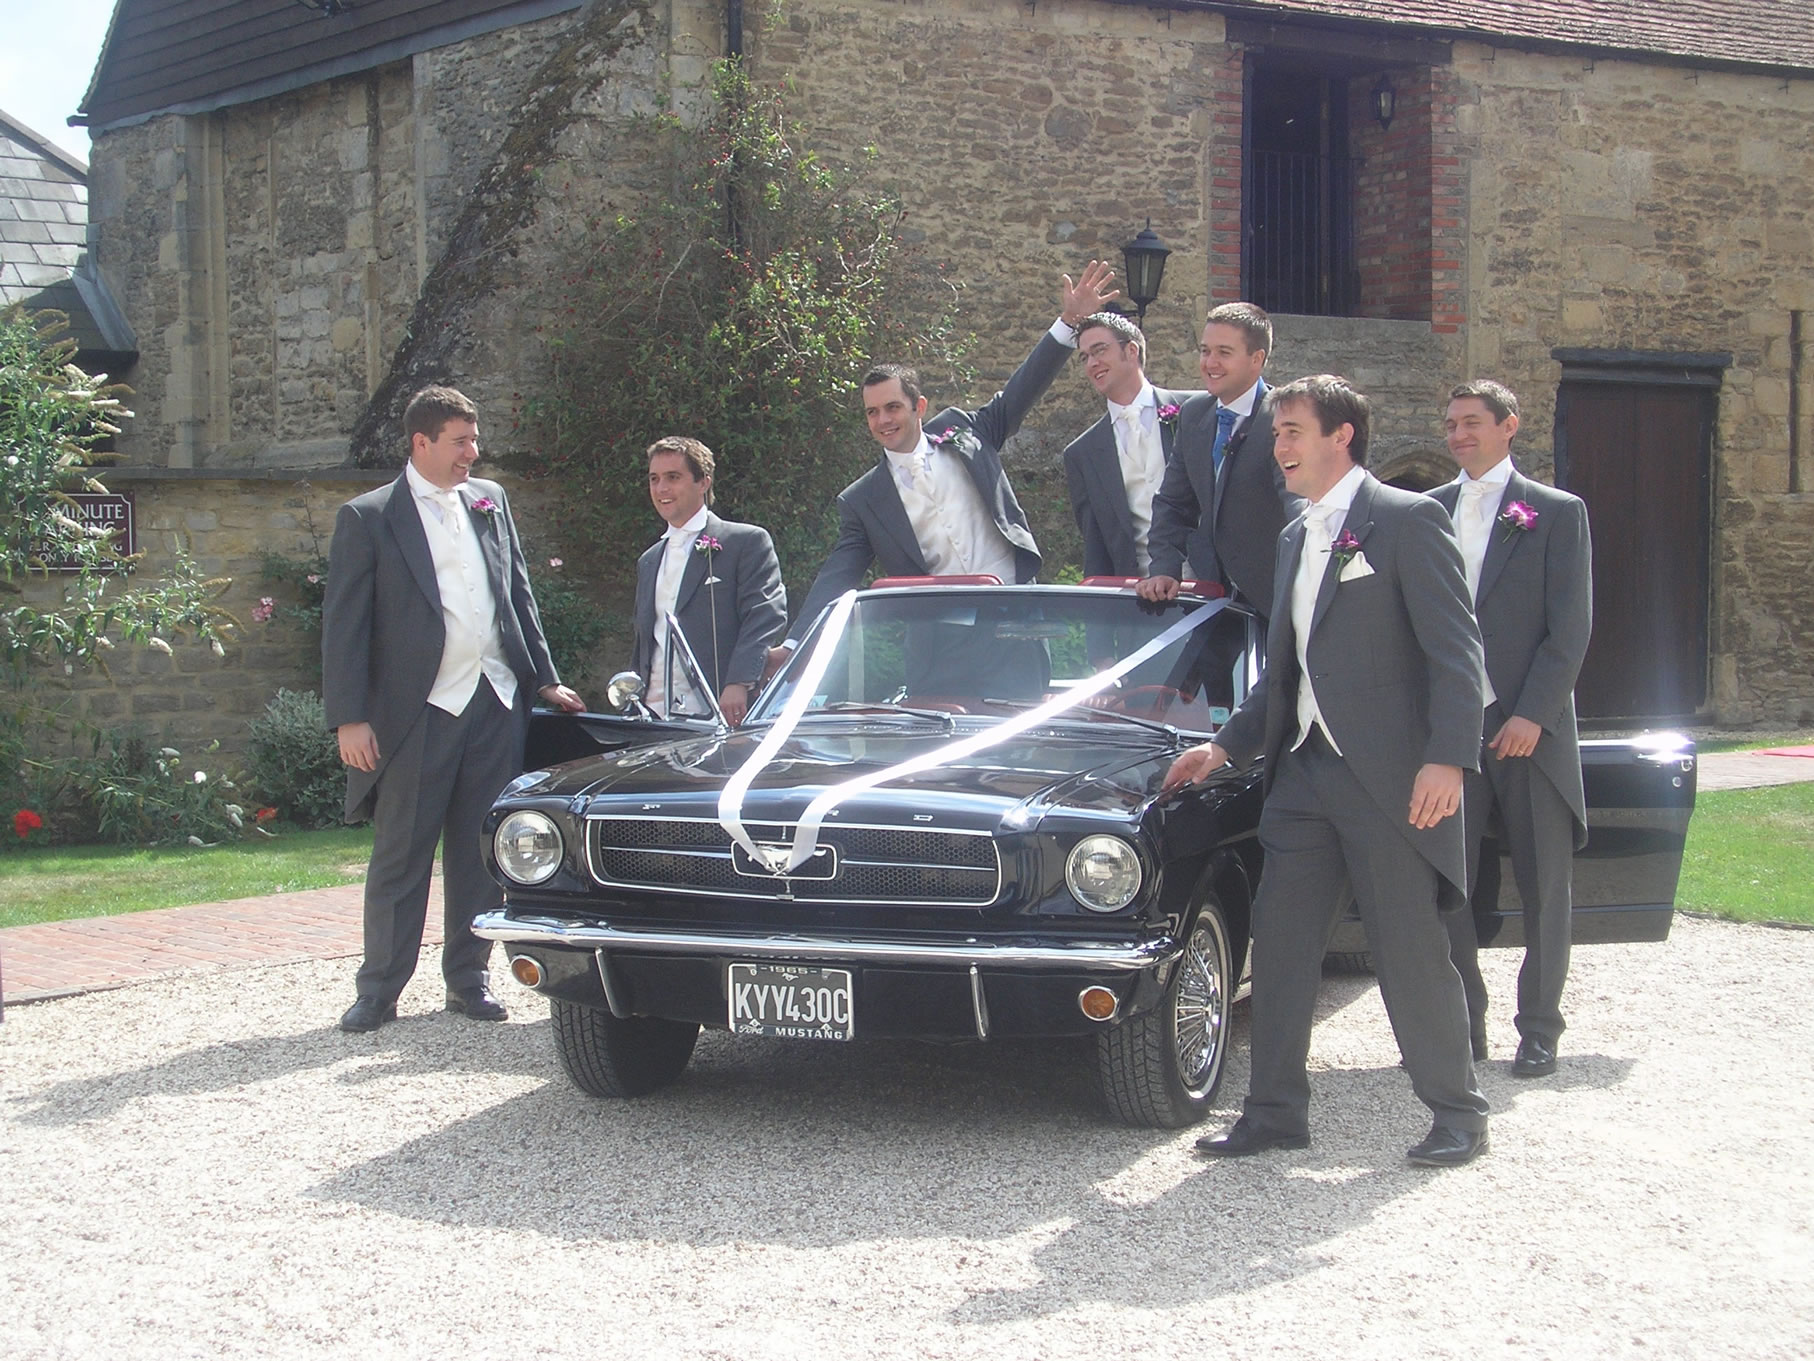 Top 16 Wacky Wedding Cars Adrian Flux Insurance